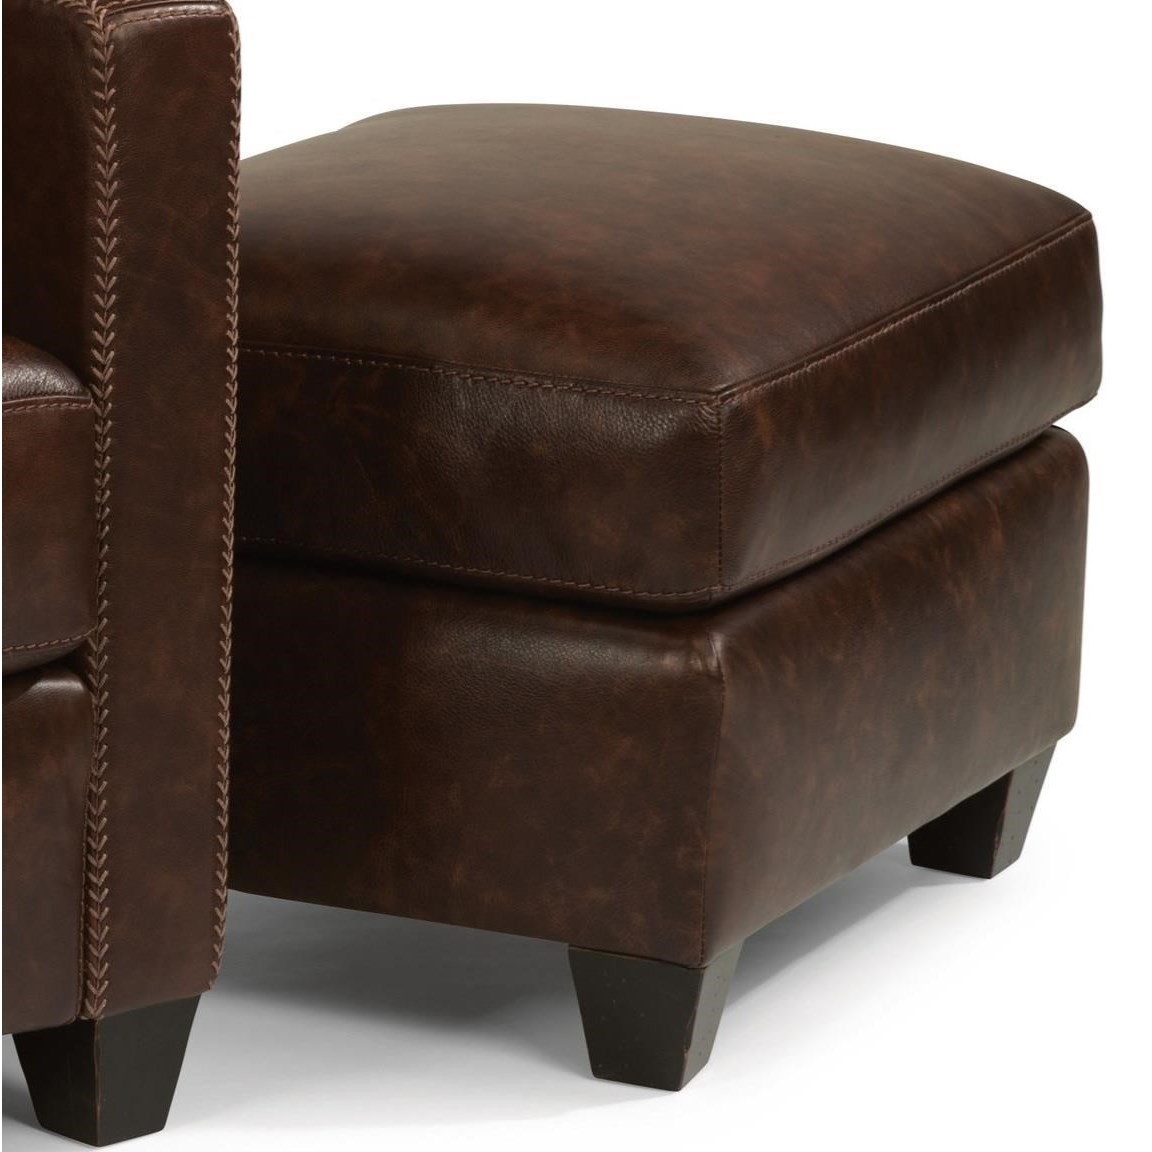 Fantastic Latitudes Roscoe Ottoman Unemploymentrelief Wooden Chair Designs For Living Room Unemploymentrelieforg